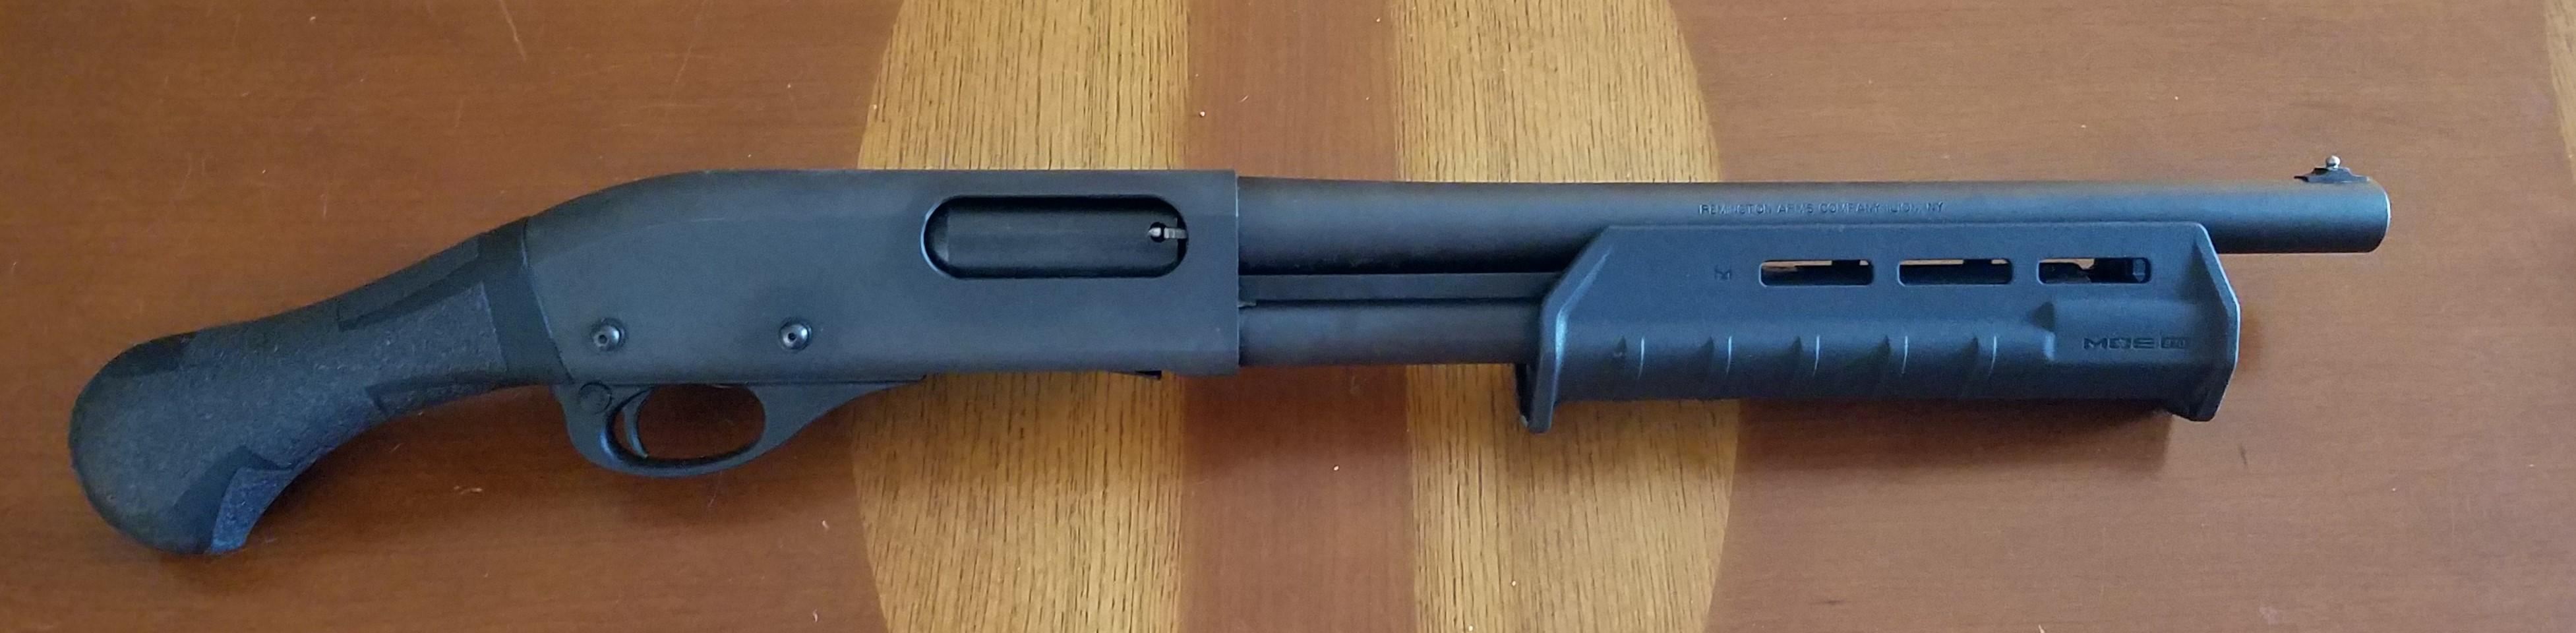 WTS:  Remington 12 gauge 870 TAC-14-20180805_172831.jpg